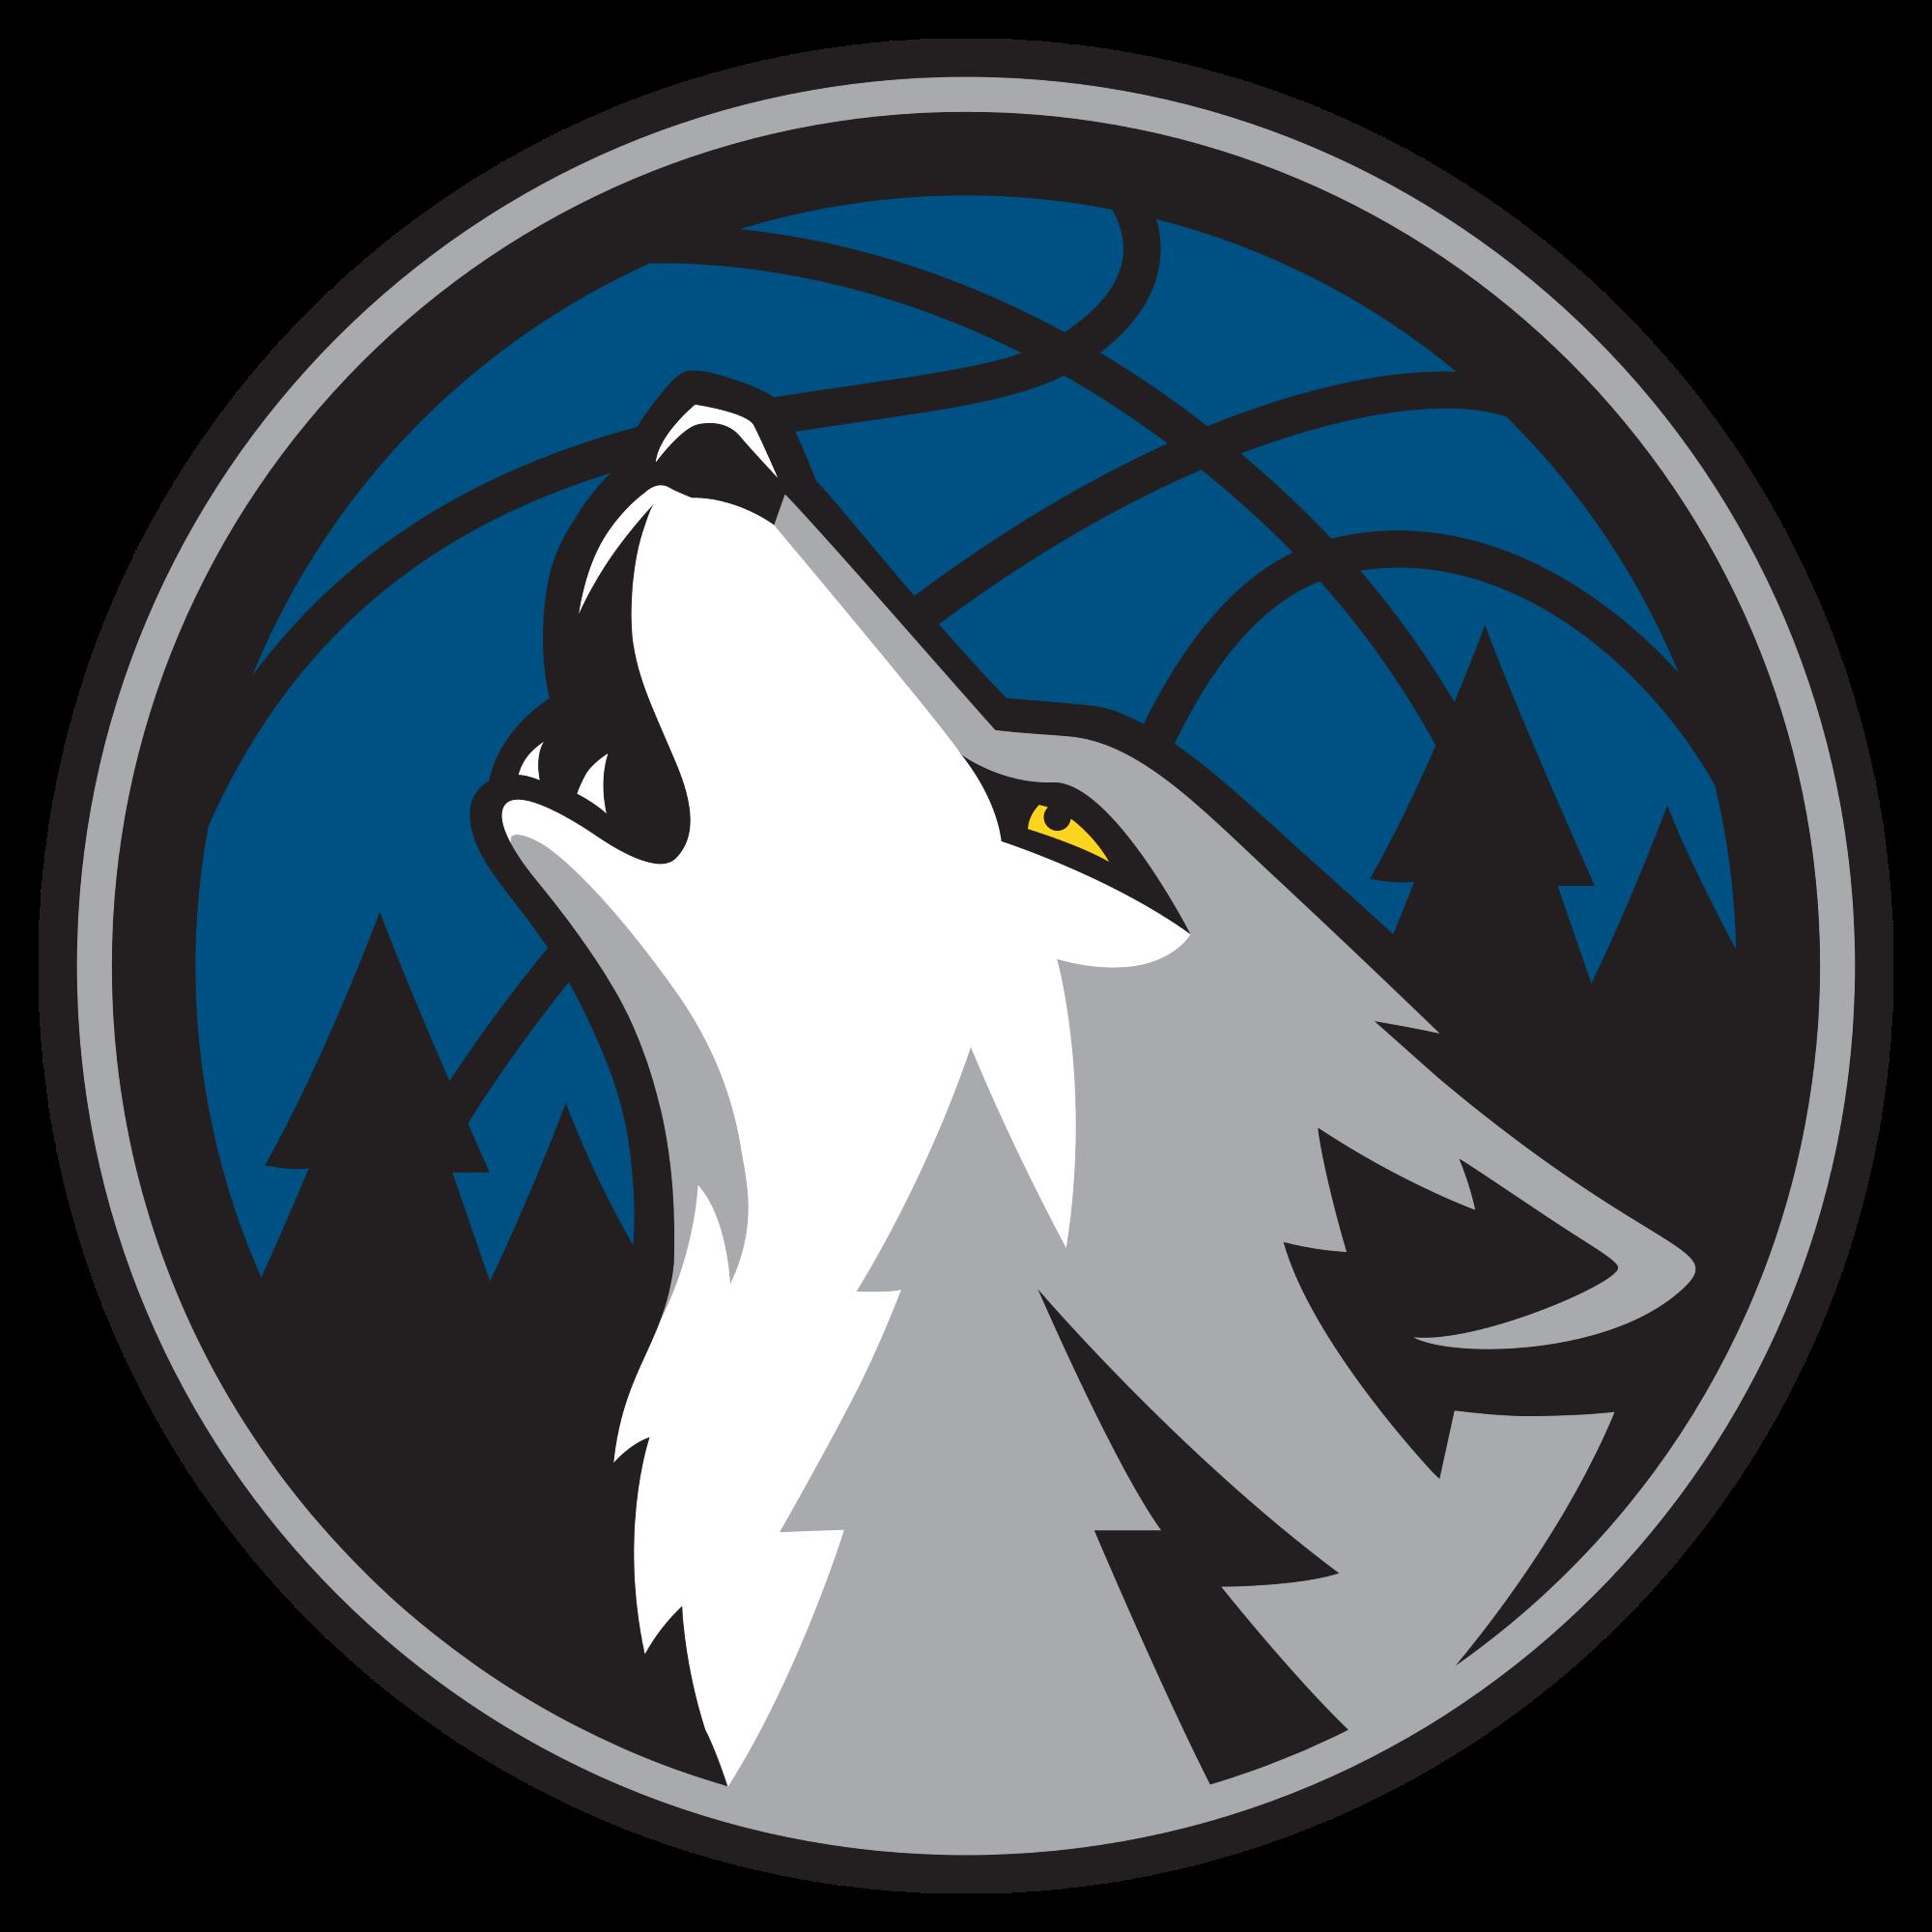 Minnesota Timberwolves Logo Png.